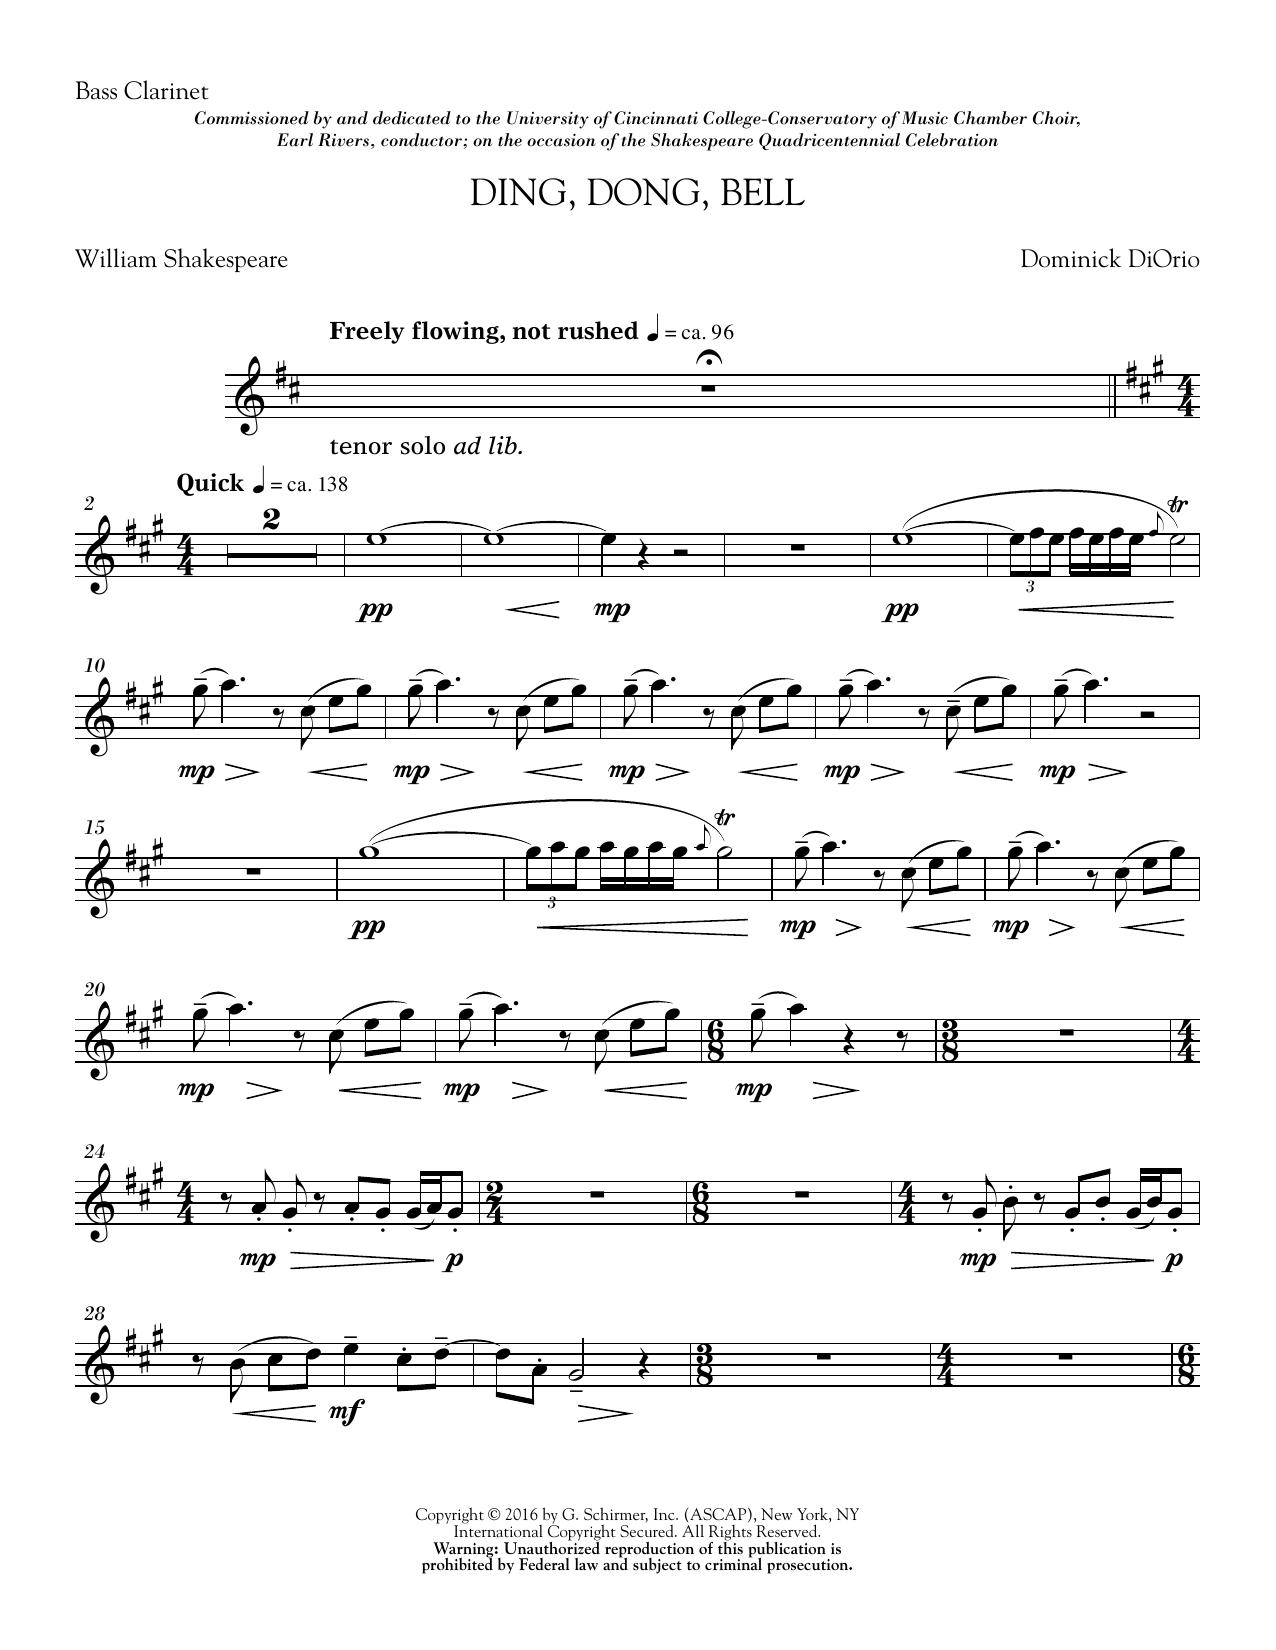 Ding, Dong, Bell - Bass Clarinet in Bb Sheet Music